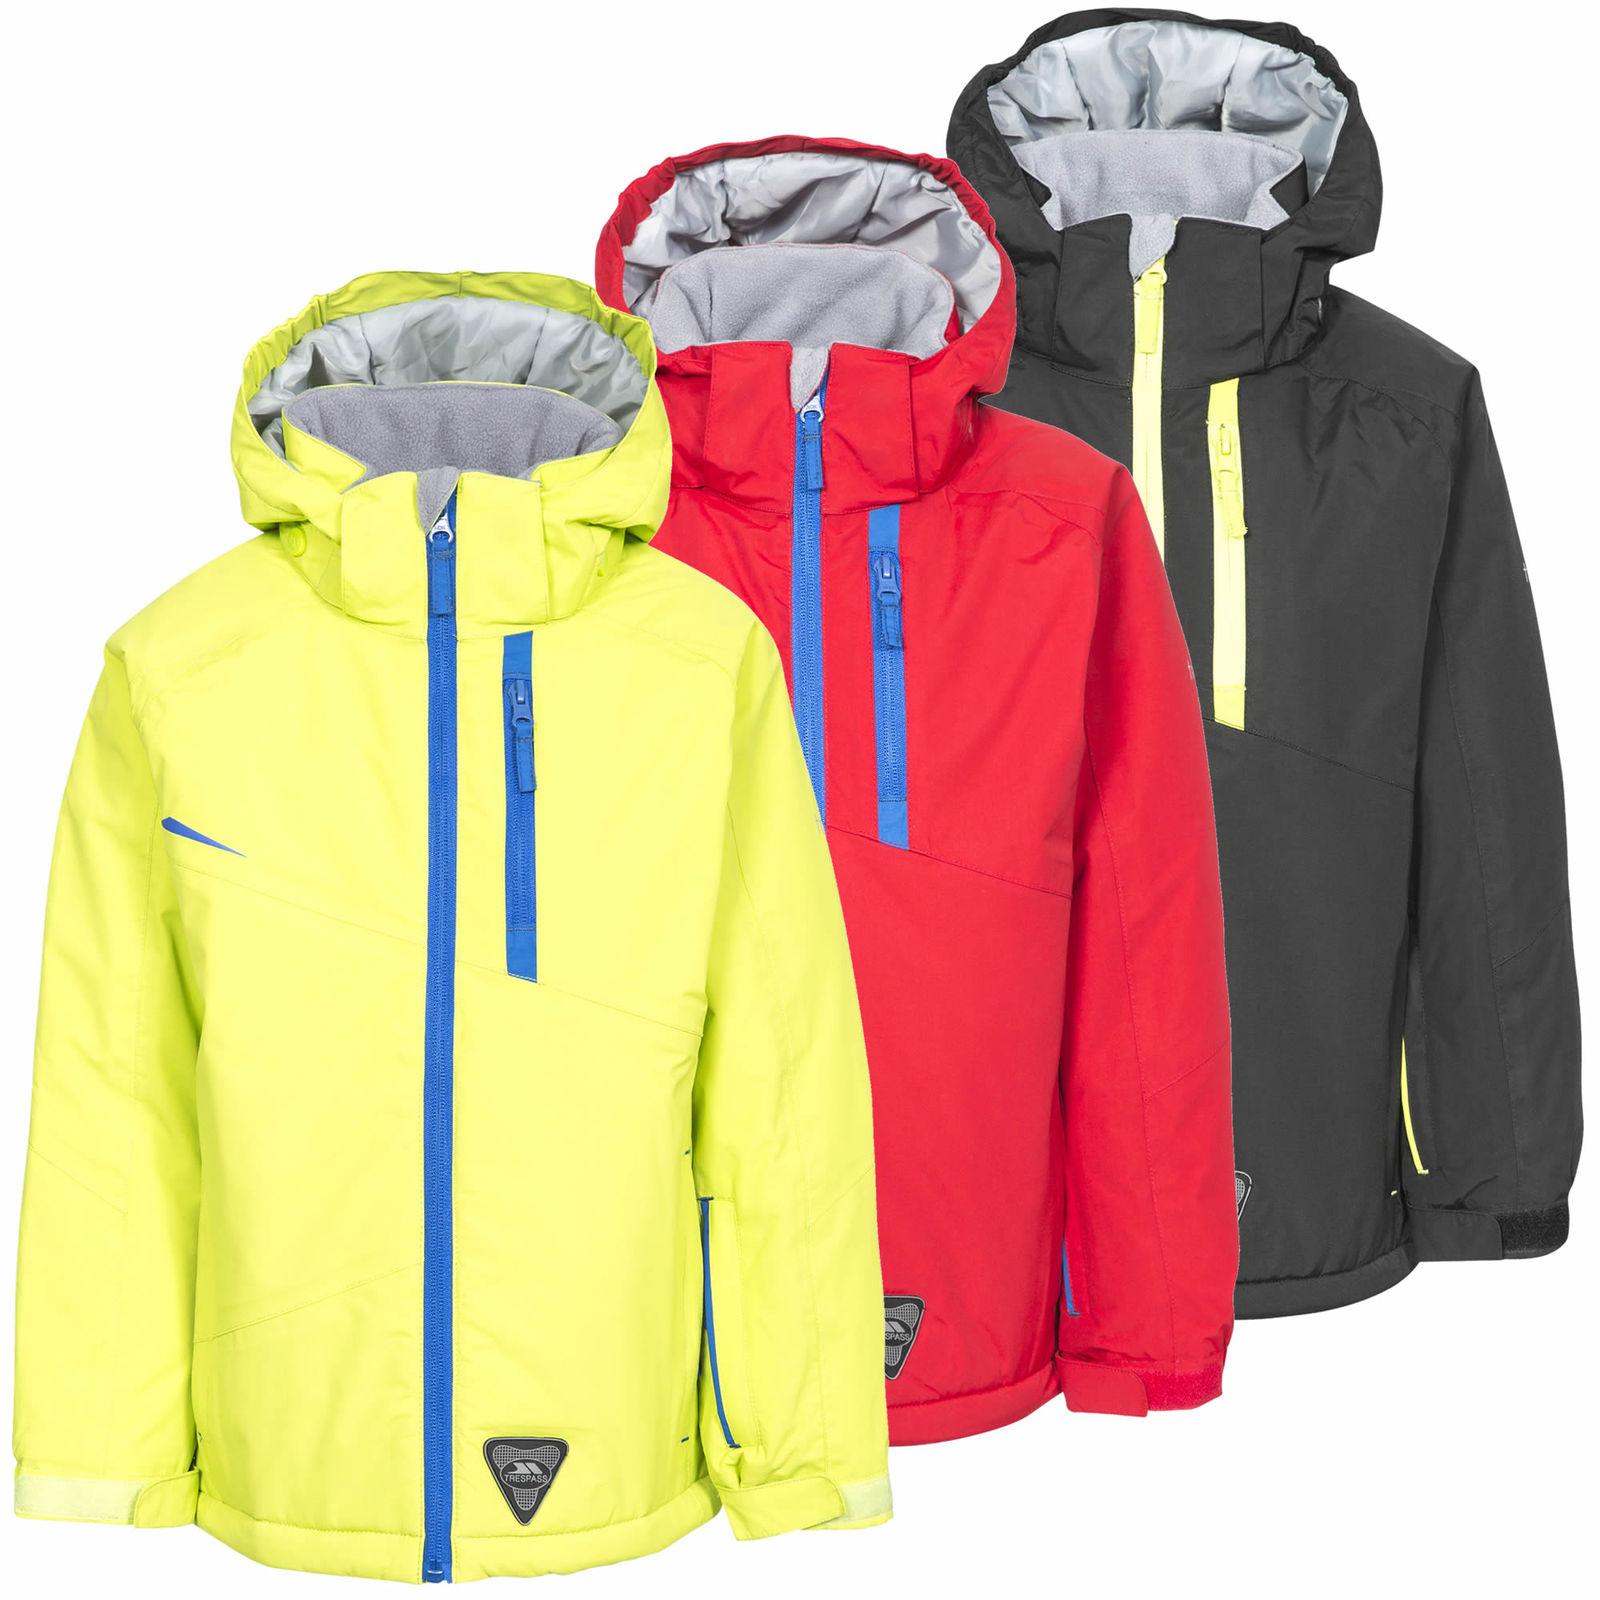 Trespass Mander Boys Waterprof Insluated Ski Jacket